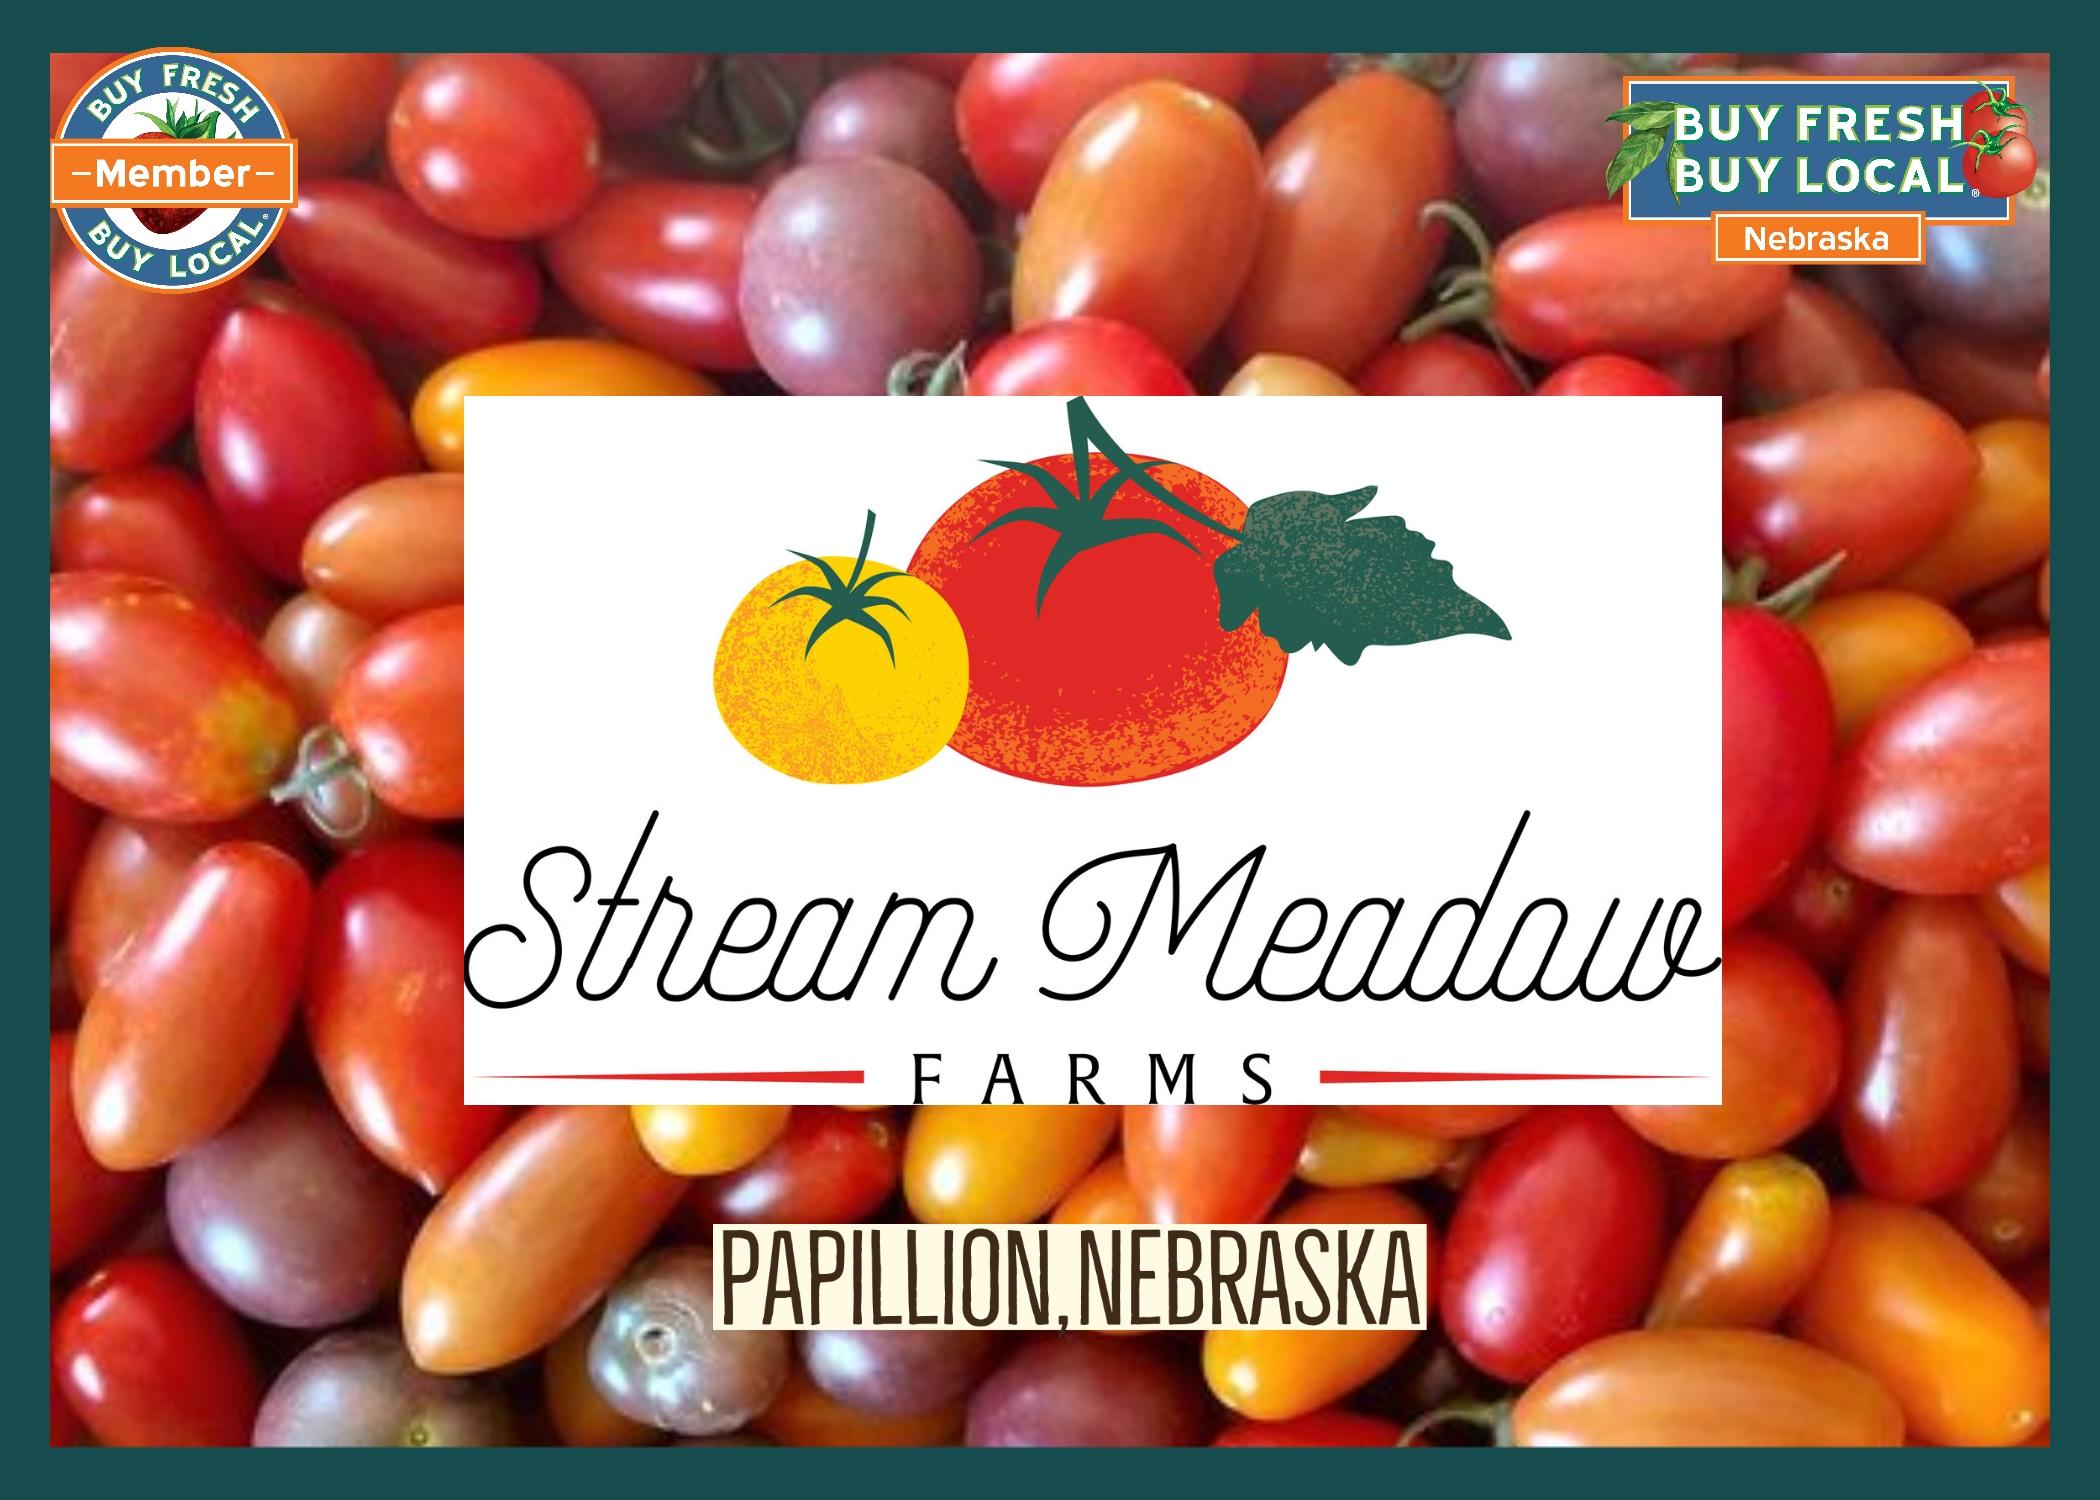 Stream Meadow Farms Papillion Nebraska